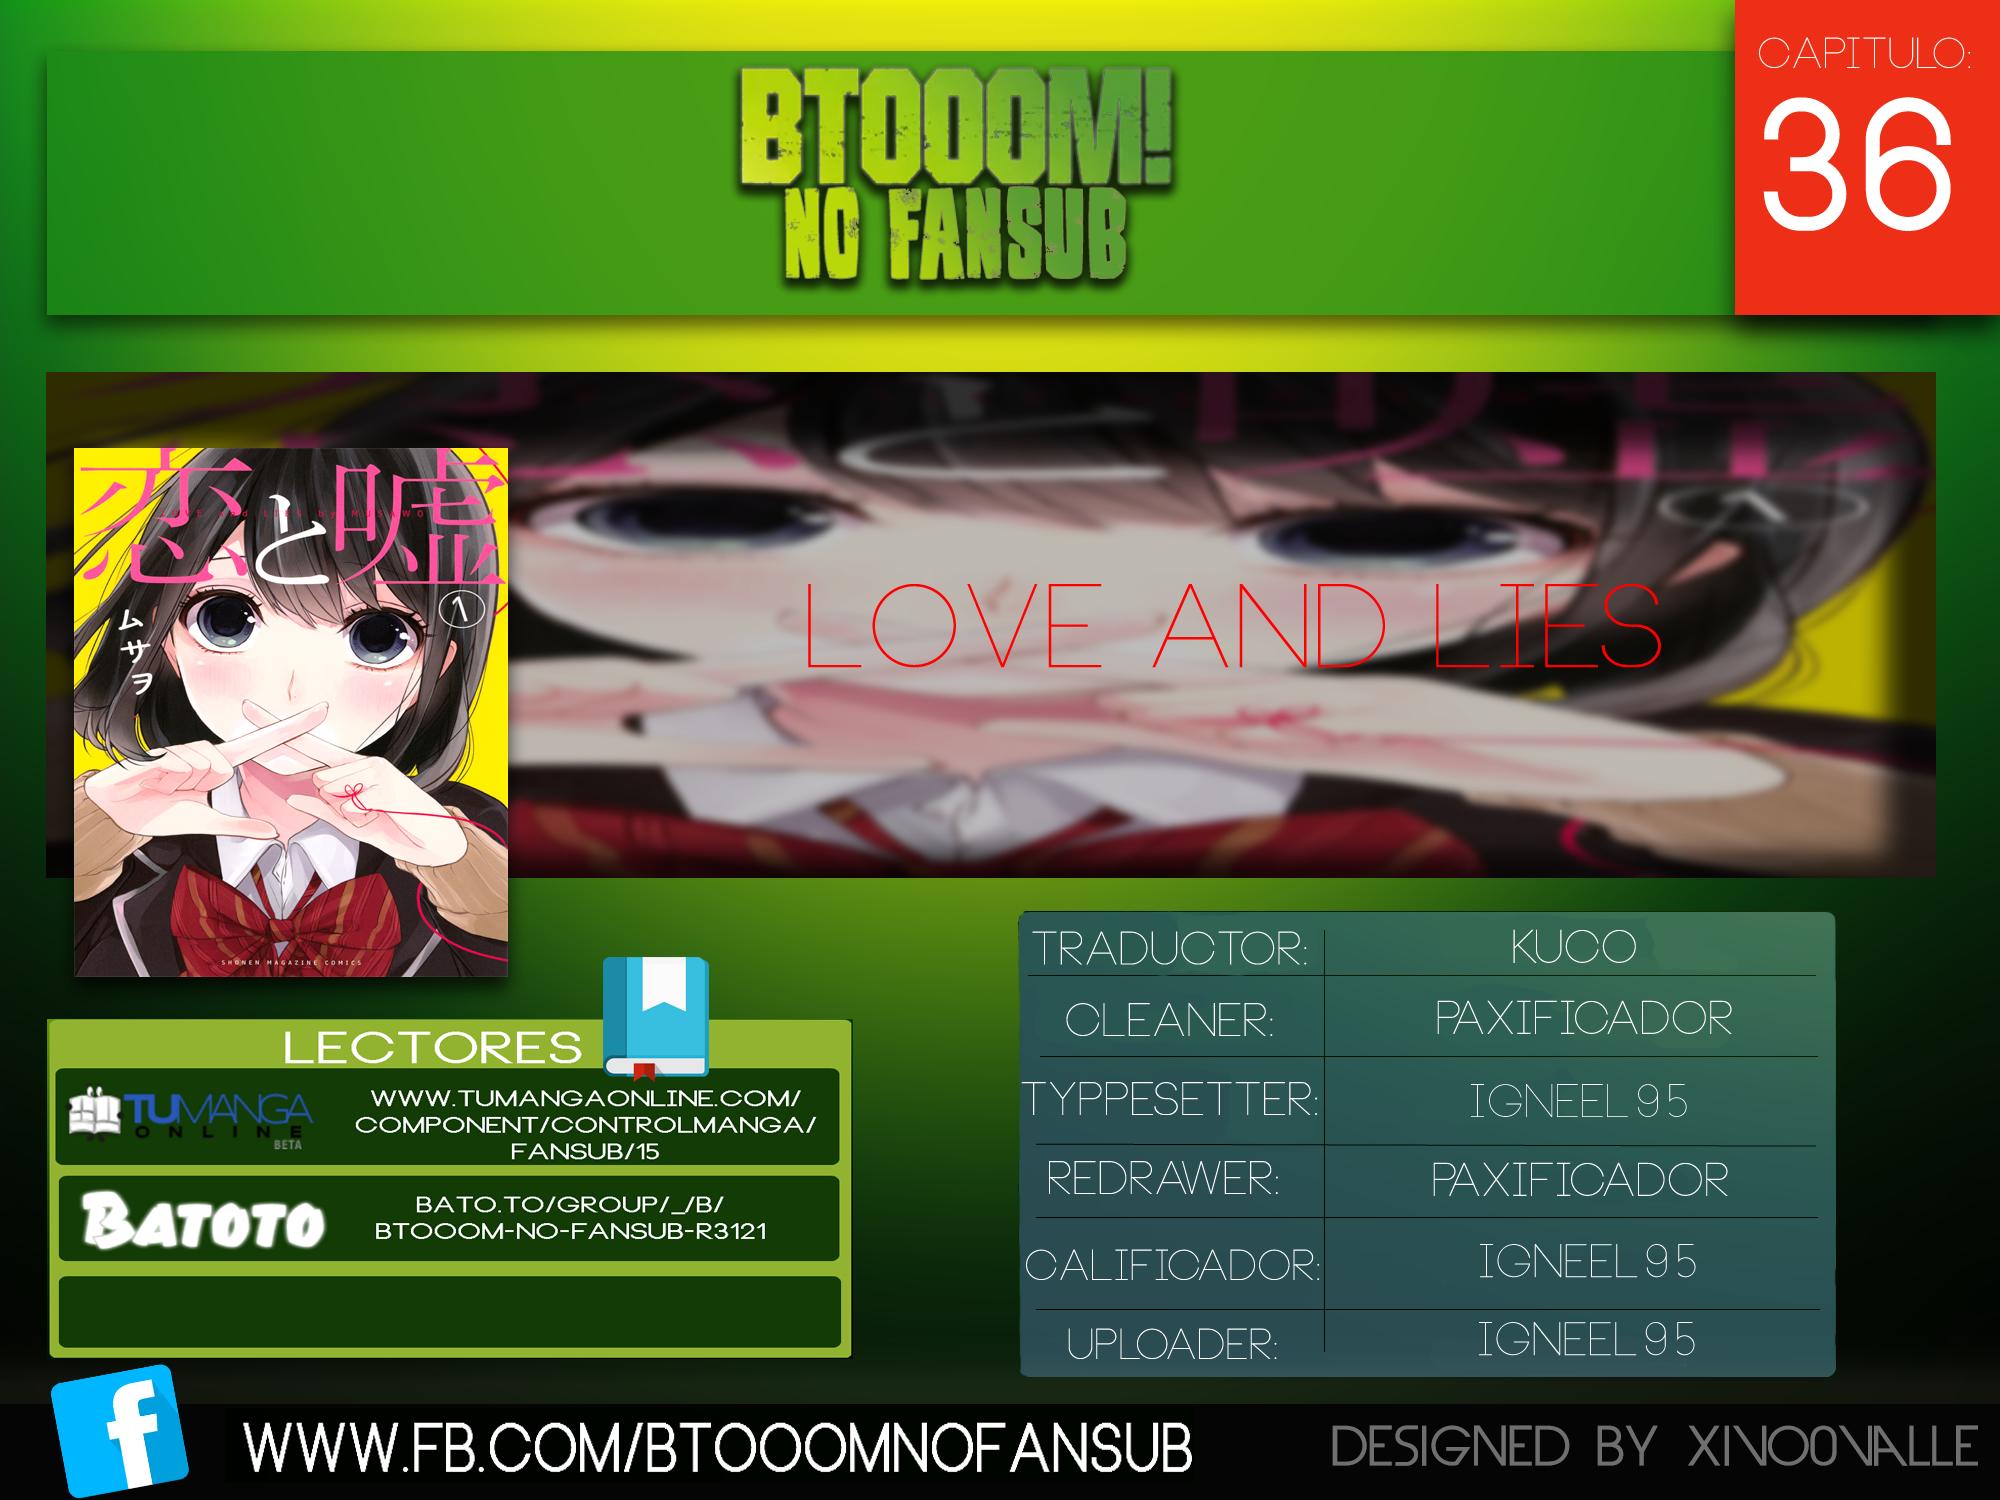 http://c5.ninemanga.com/es_manga/14/14734/362437/faf5b2186af3eb996b83abd883c7fa9d.jpg Page 1